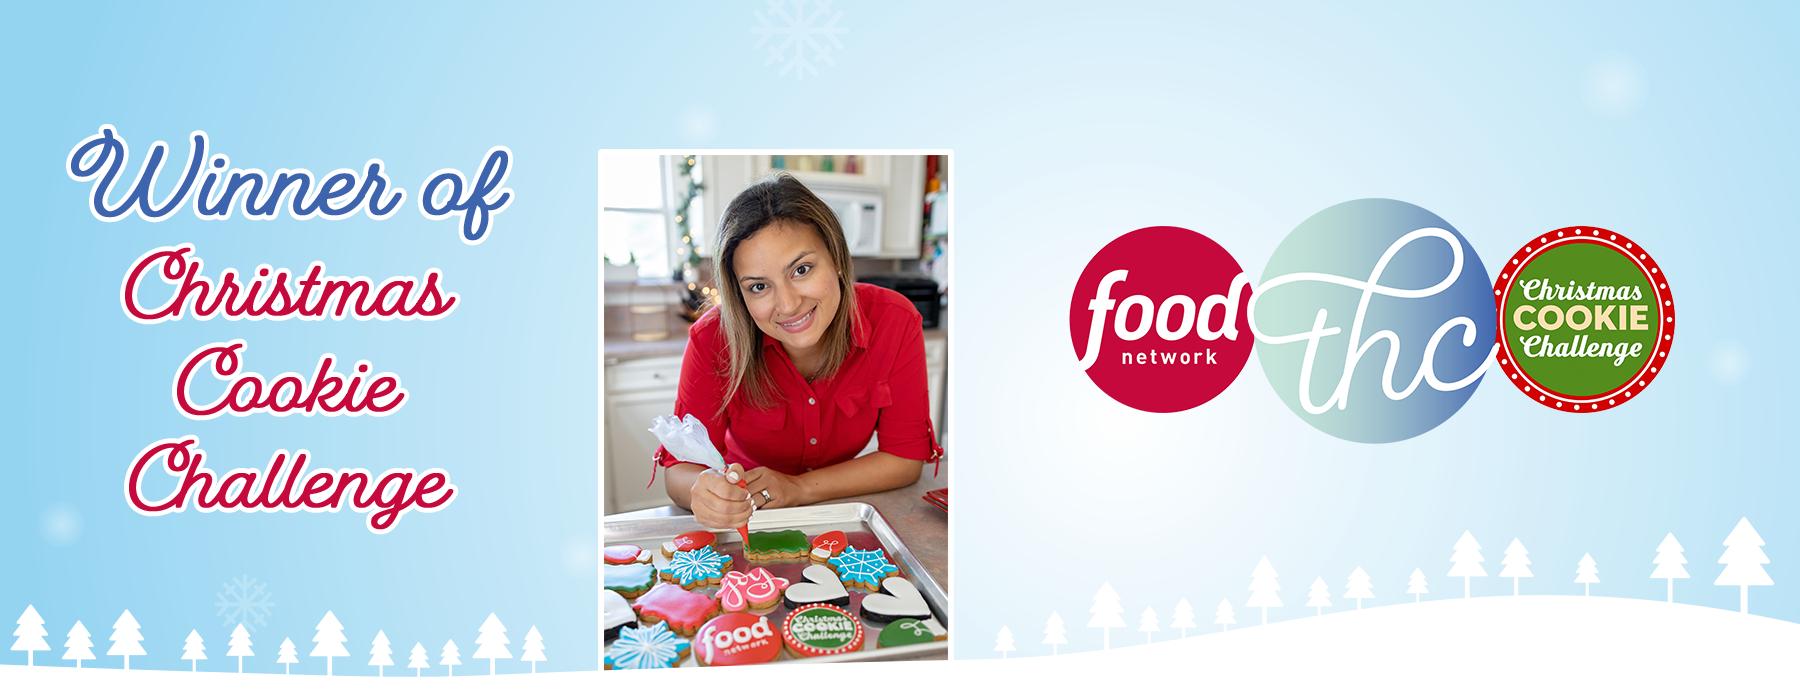 Winner of Food Network's Christmas Cookie Challenge!